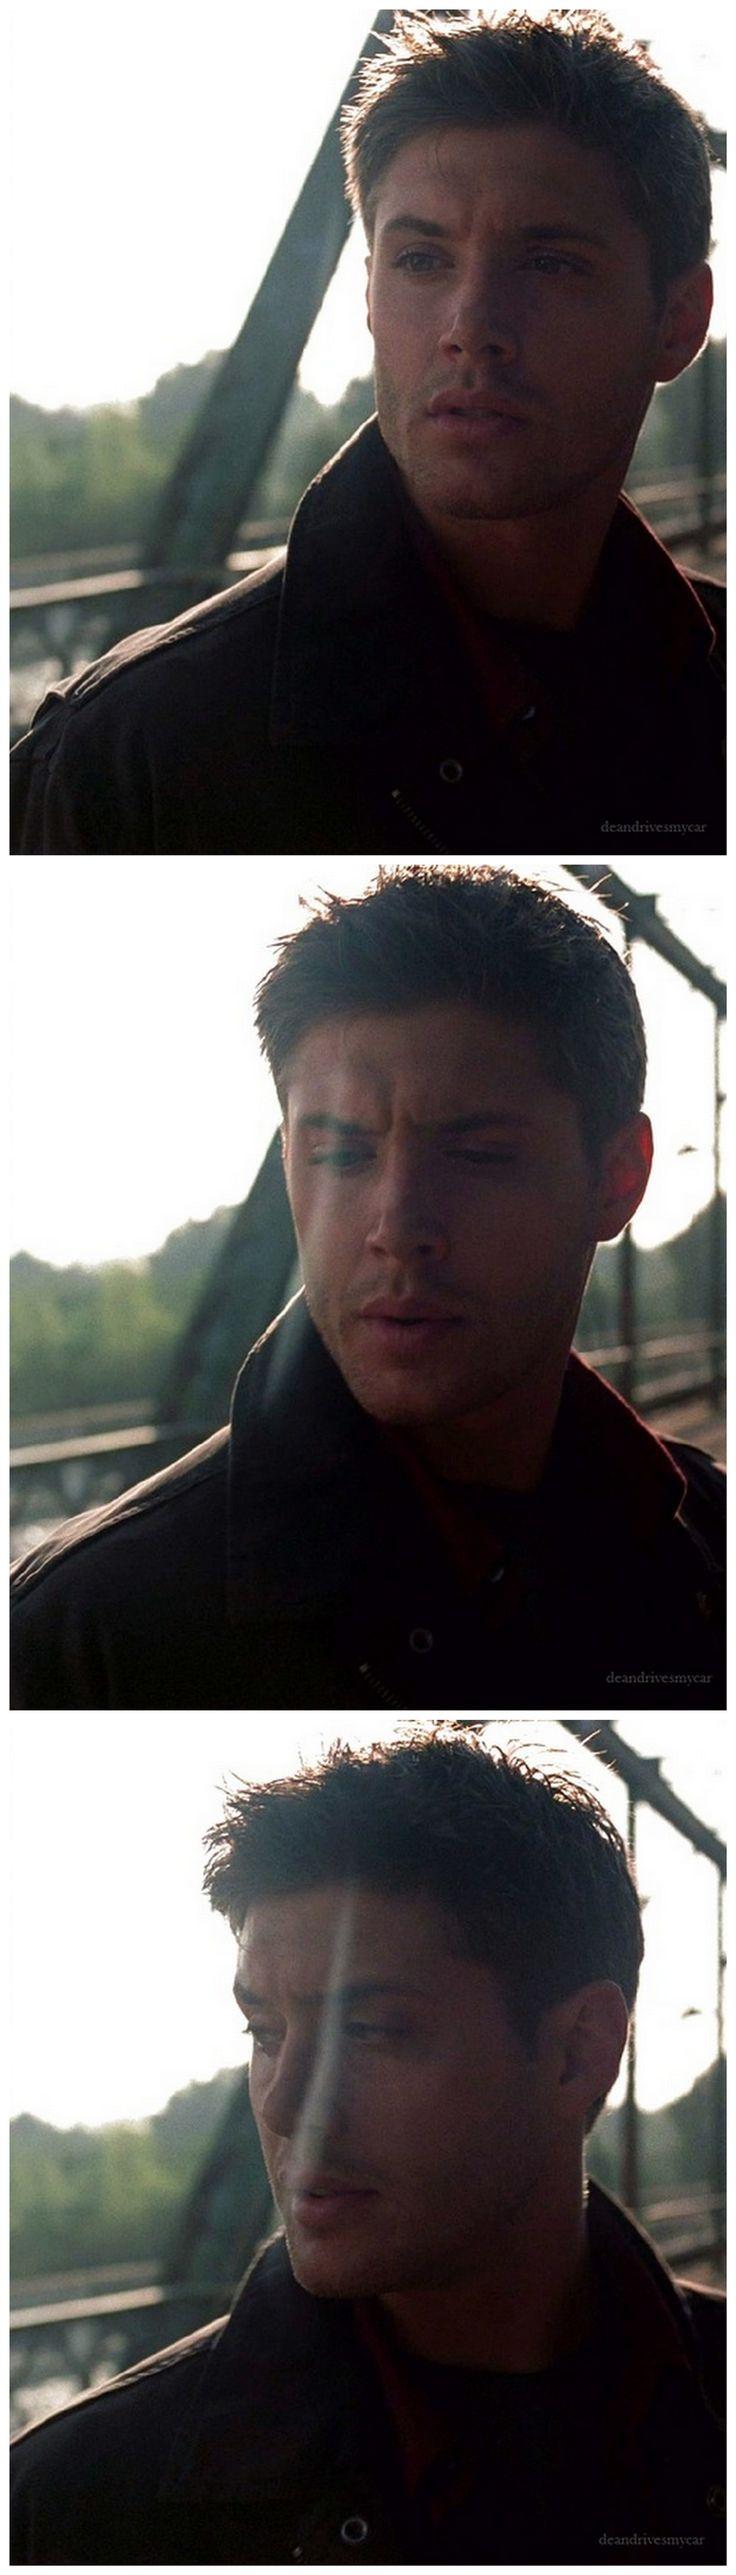 Dean - Supernatural Pilot - stunning edit from deandrivesmycar on Tumblr